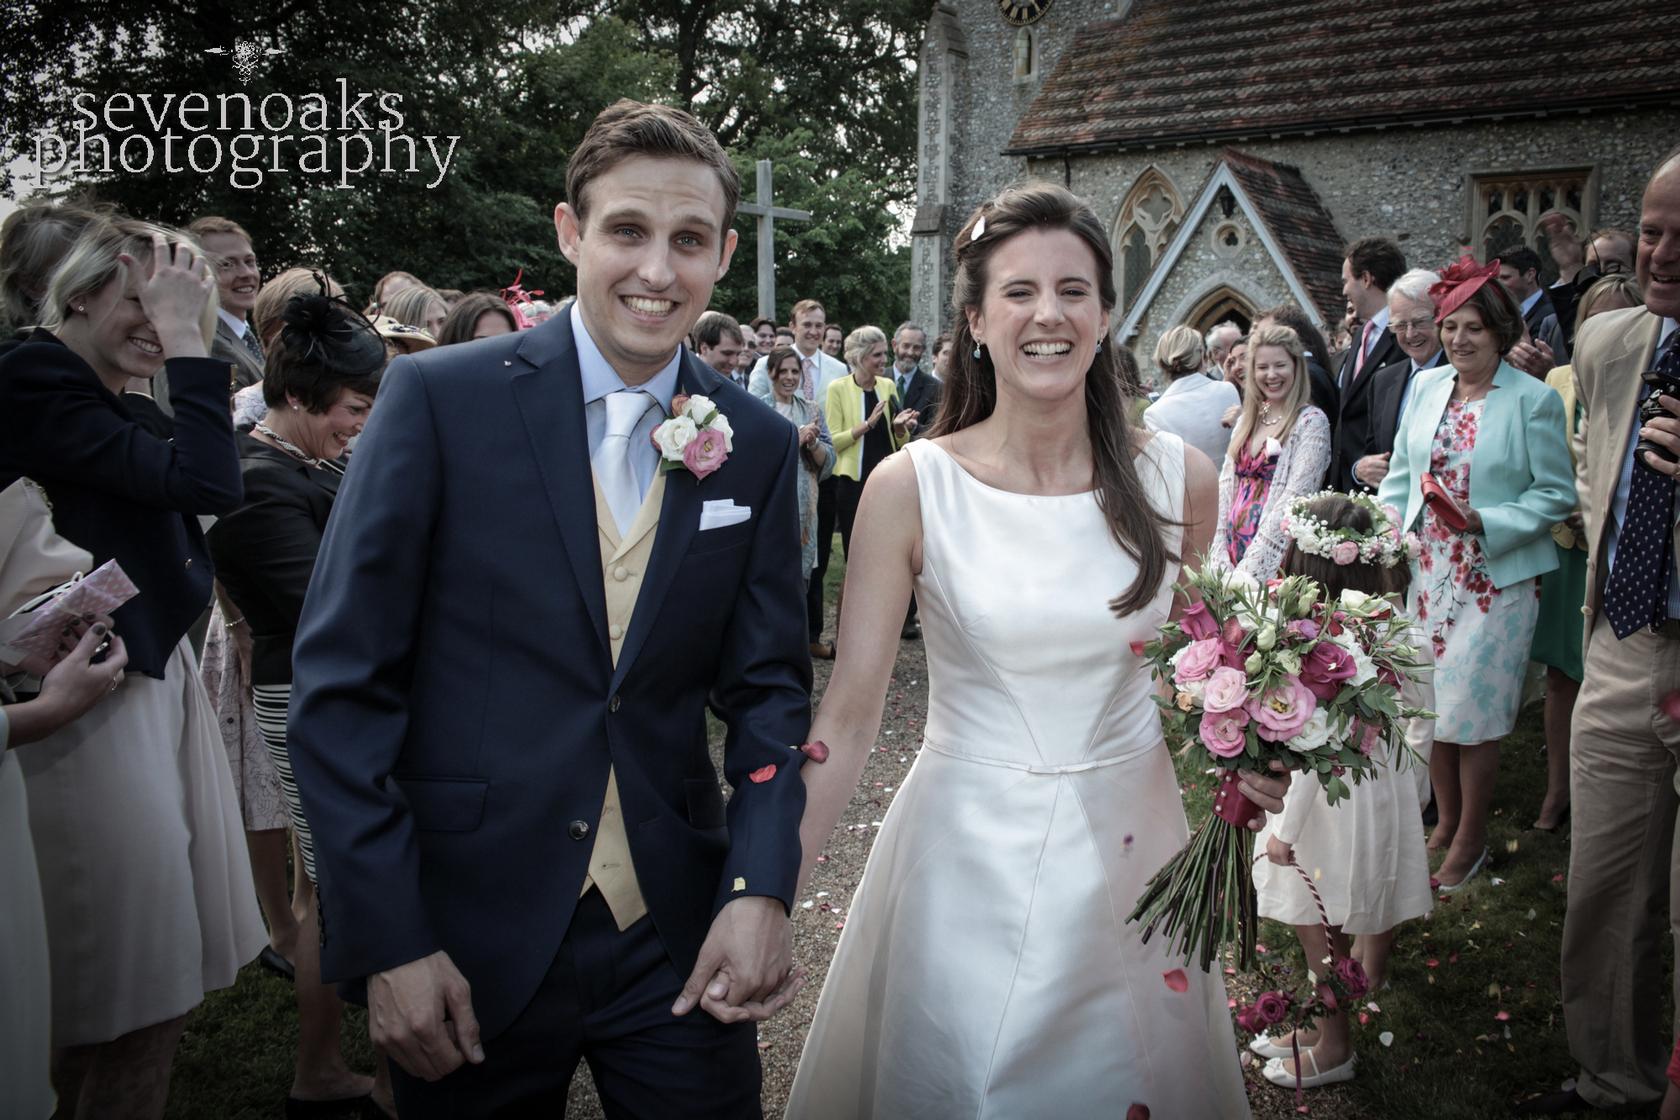 Sevenoaks documentary wedding photographer-117.jpg